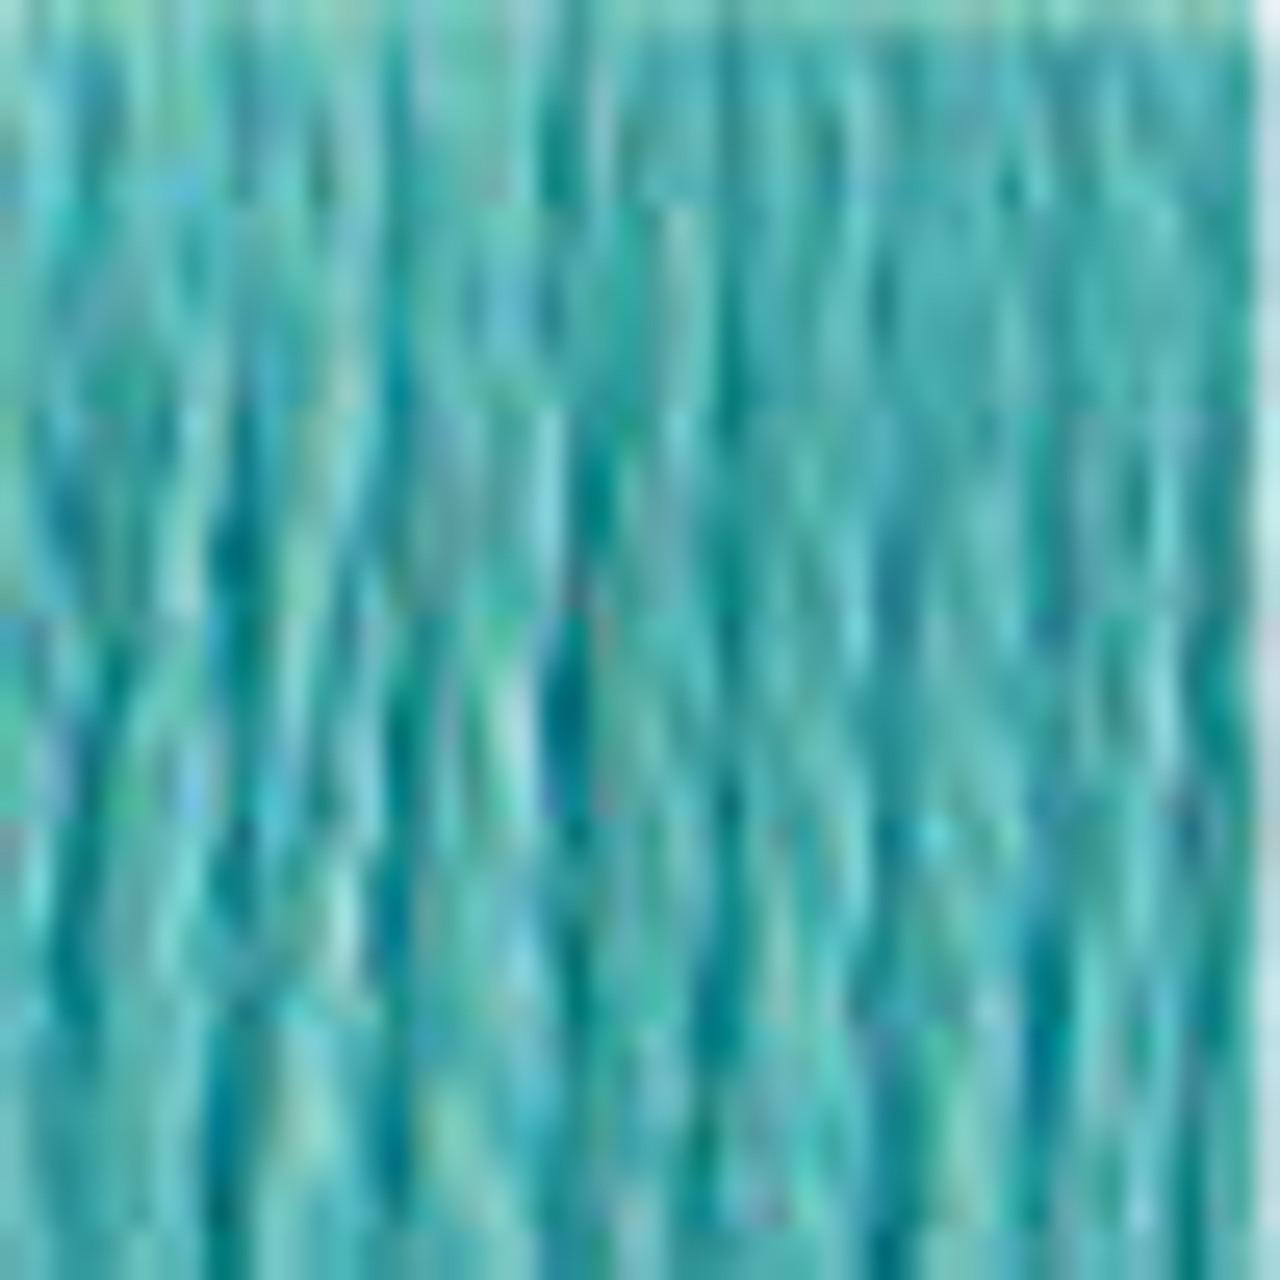 DMC # 597 Turquoise Floss / Thread